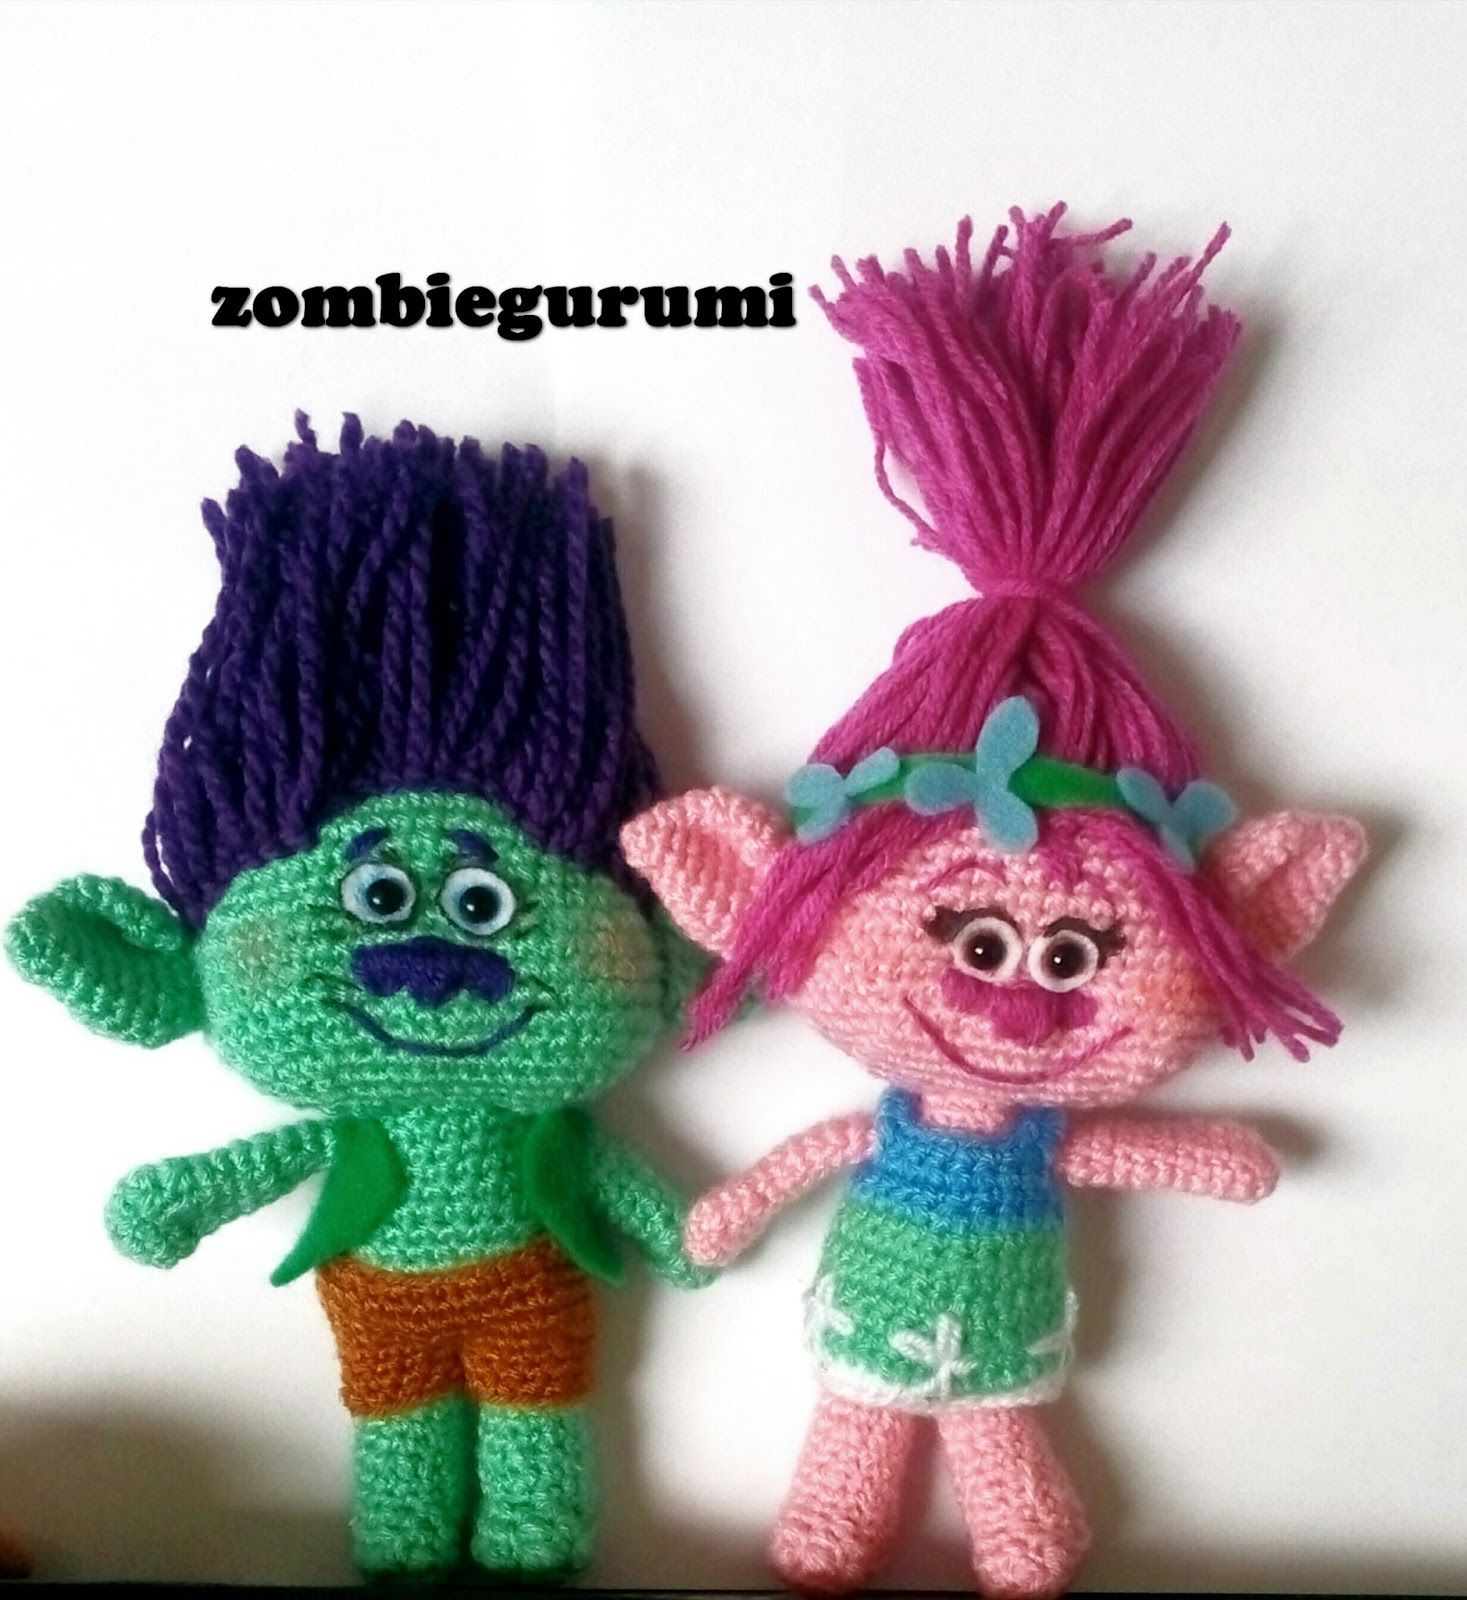 Crochet Pattern For Troll Hat : trolls amigurumi crochet toys Pinterest Amigurumi